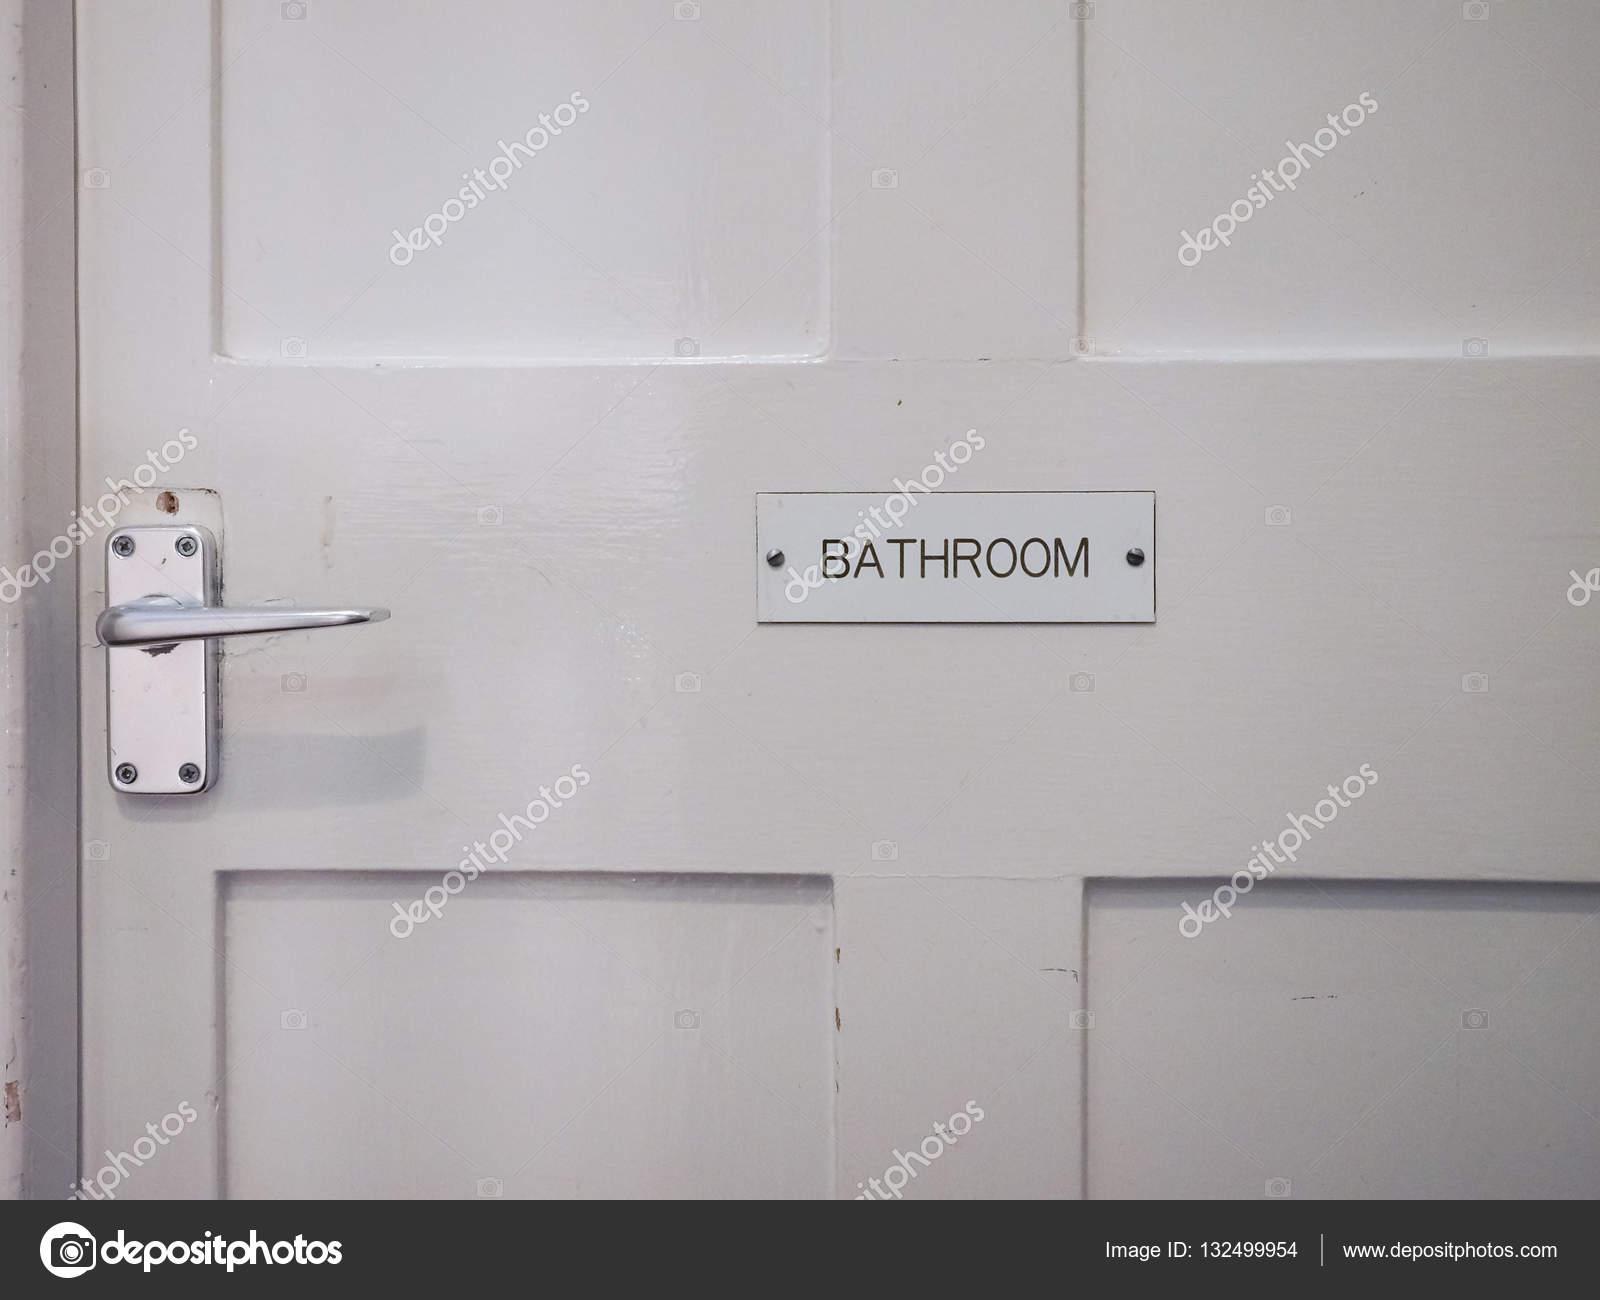 Tür detail  Badezimmer Tür detail — Stockfoto #132499954